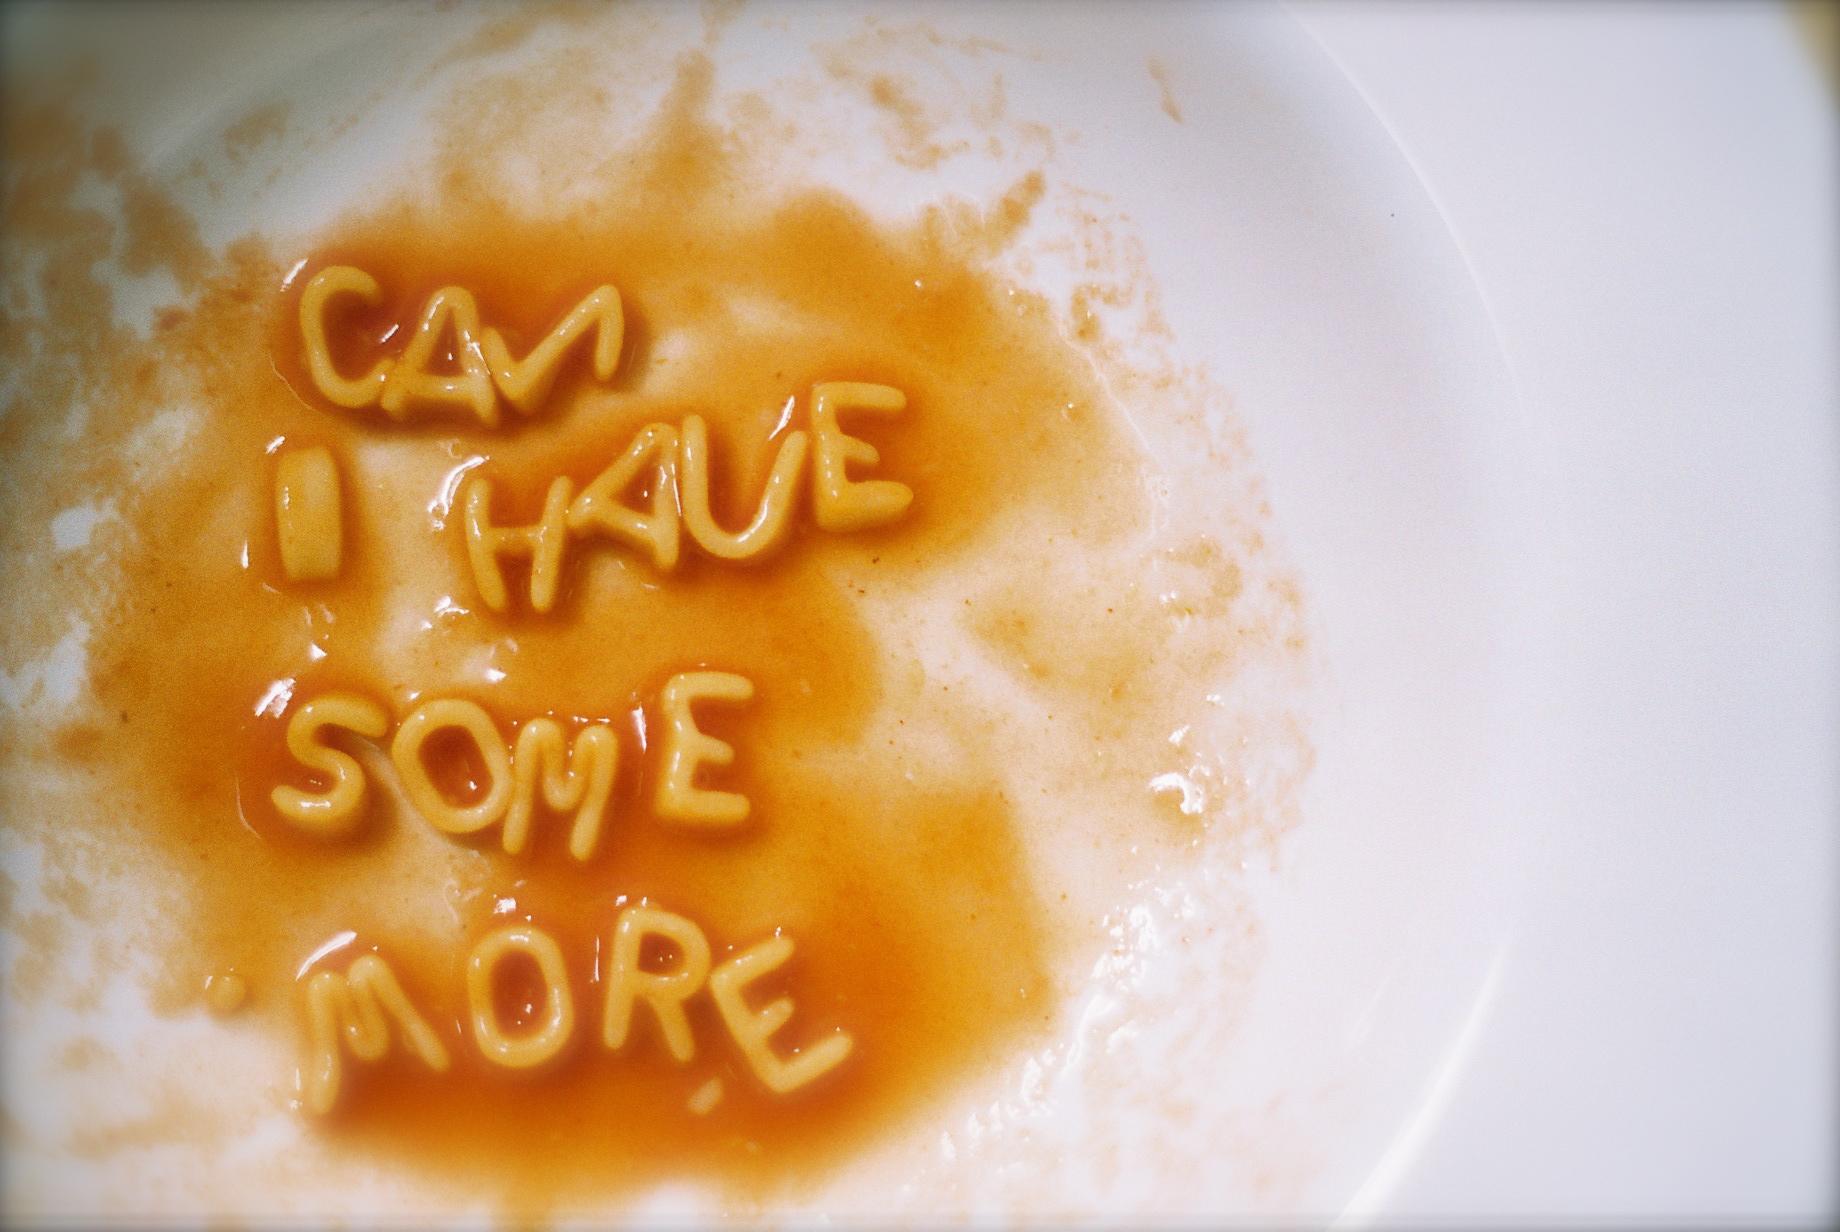 Spaagetti words